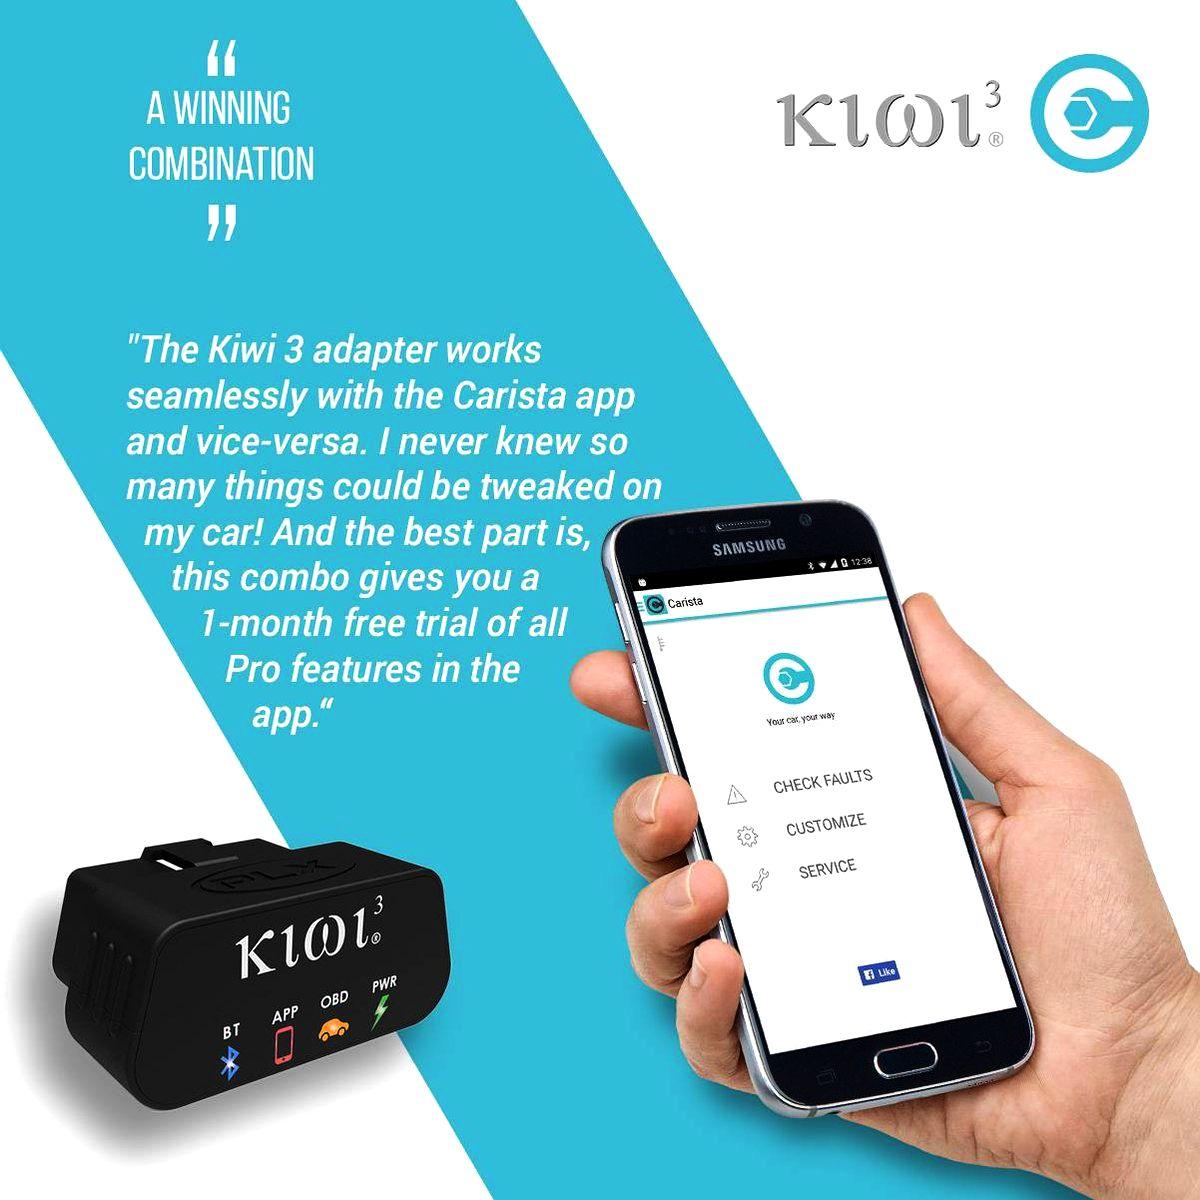 Kiwi 3 | #Automotive #Car Customization | Smartphone